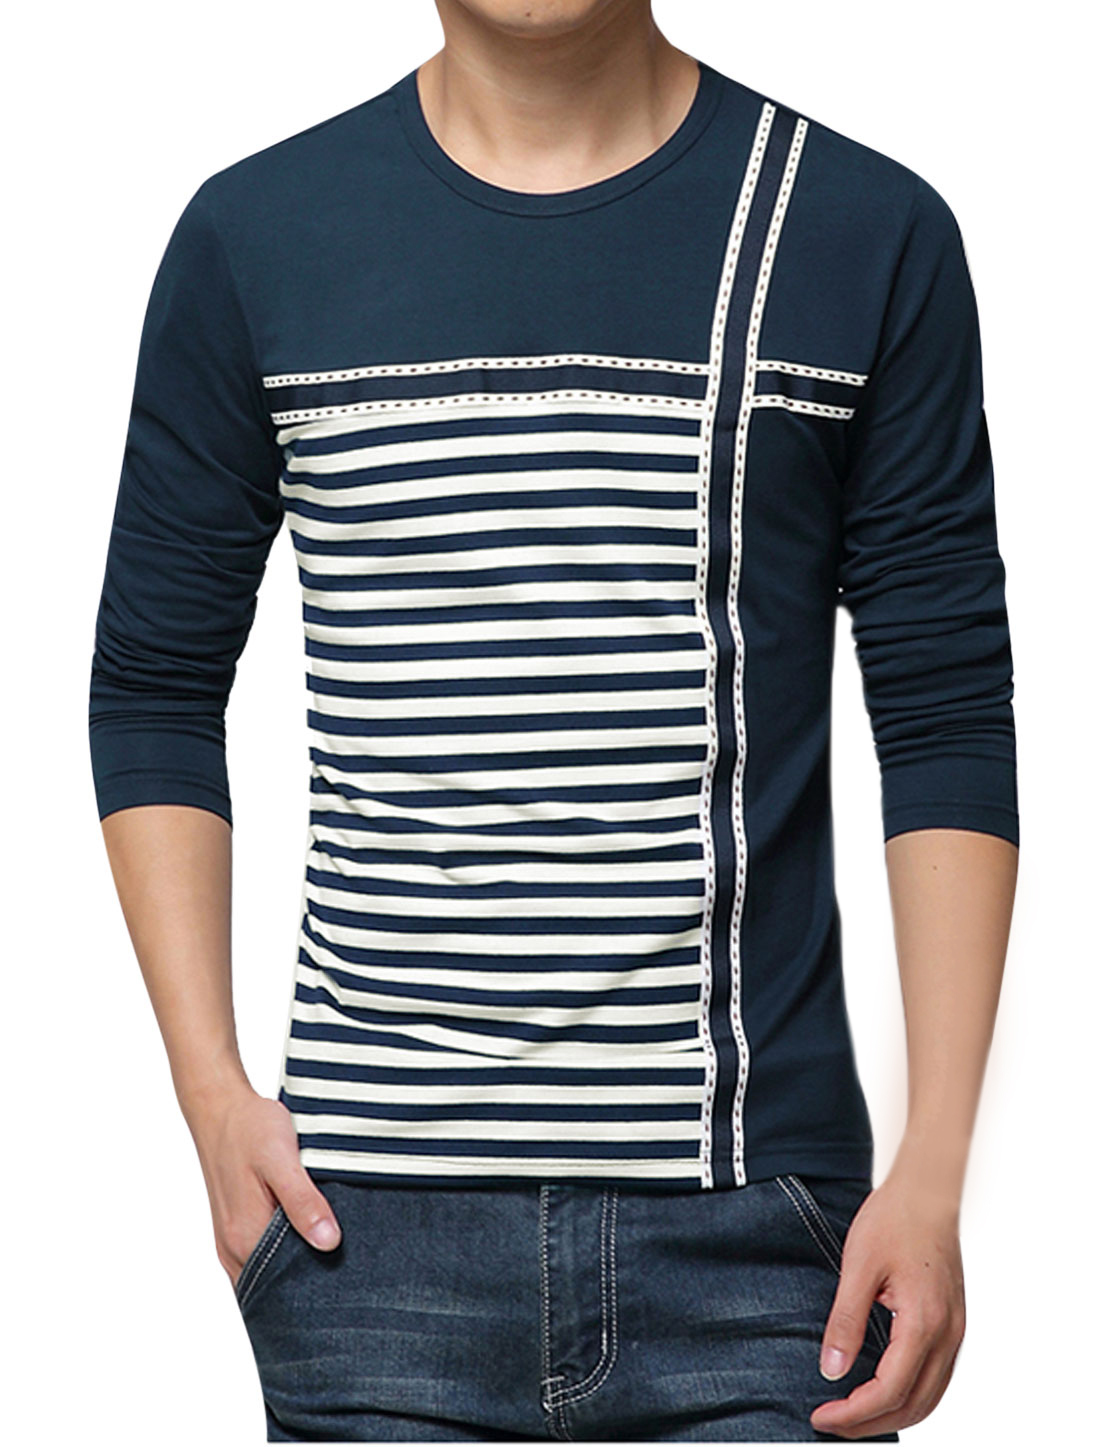 Man Stripes Round Neck Long Sleeves Panel T-shirt Dark Blue M